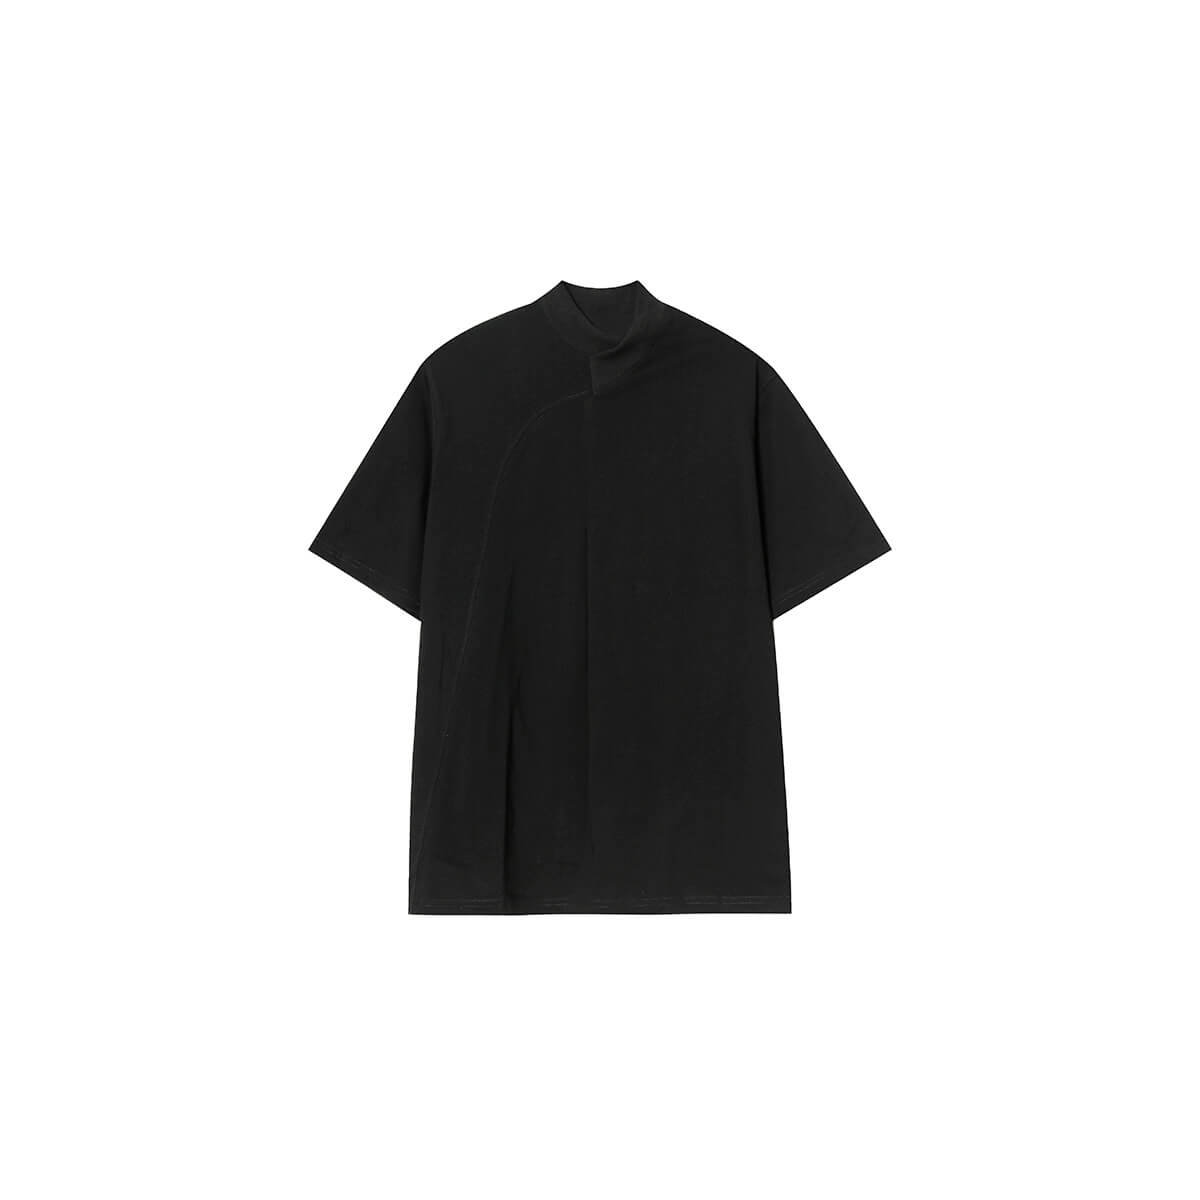 Футболка Cui Layout Studio Minimalist T-shirt Padded Rounded Collar Black